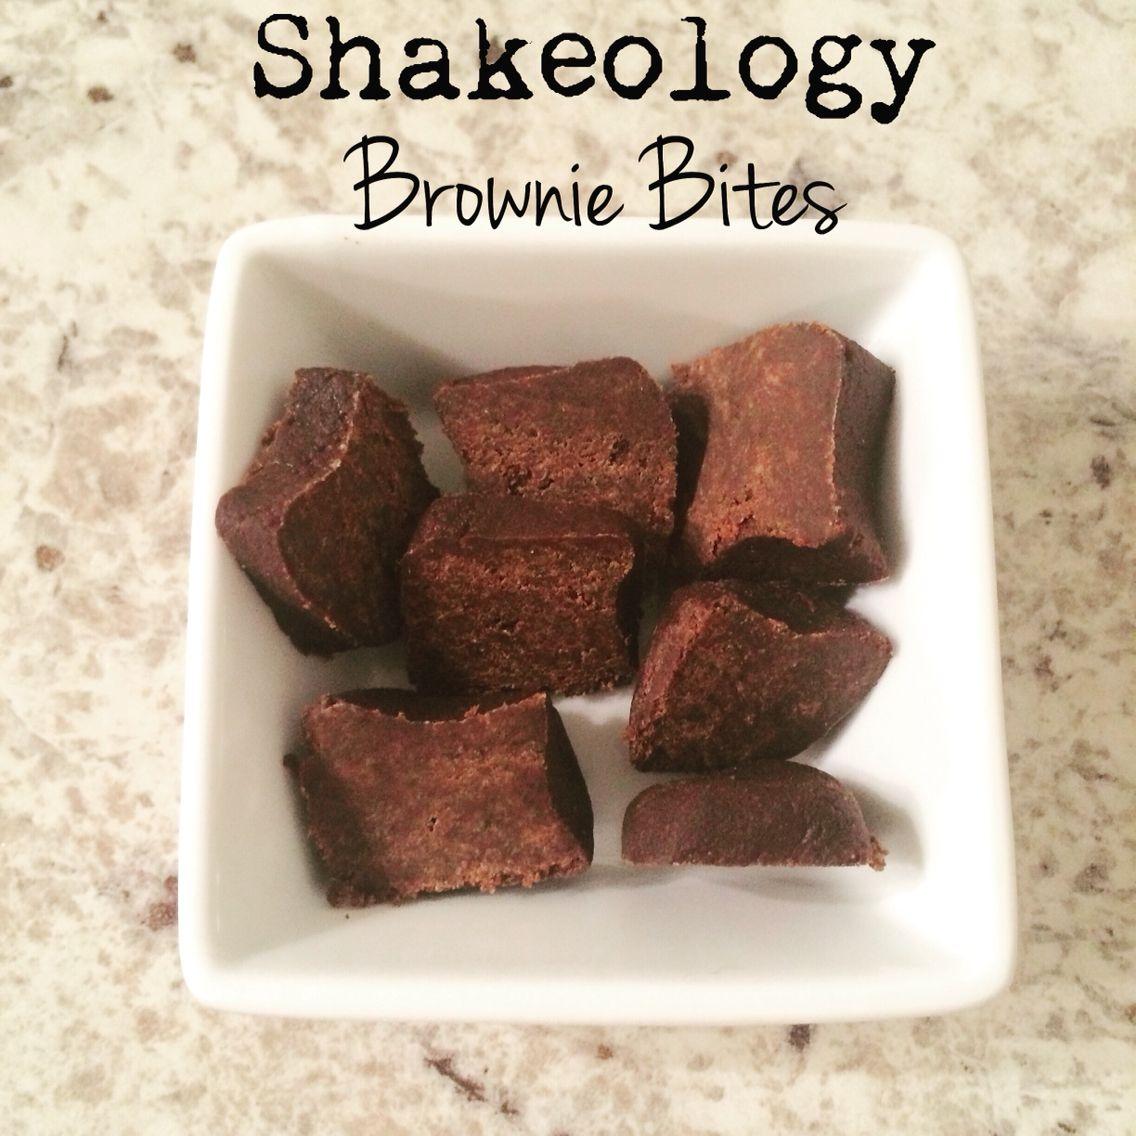 NO BAKE Chocolate Vegan Shakeology brownie bites 1 scoop Chocolate ...